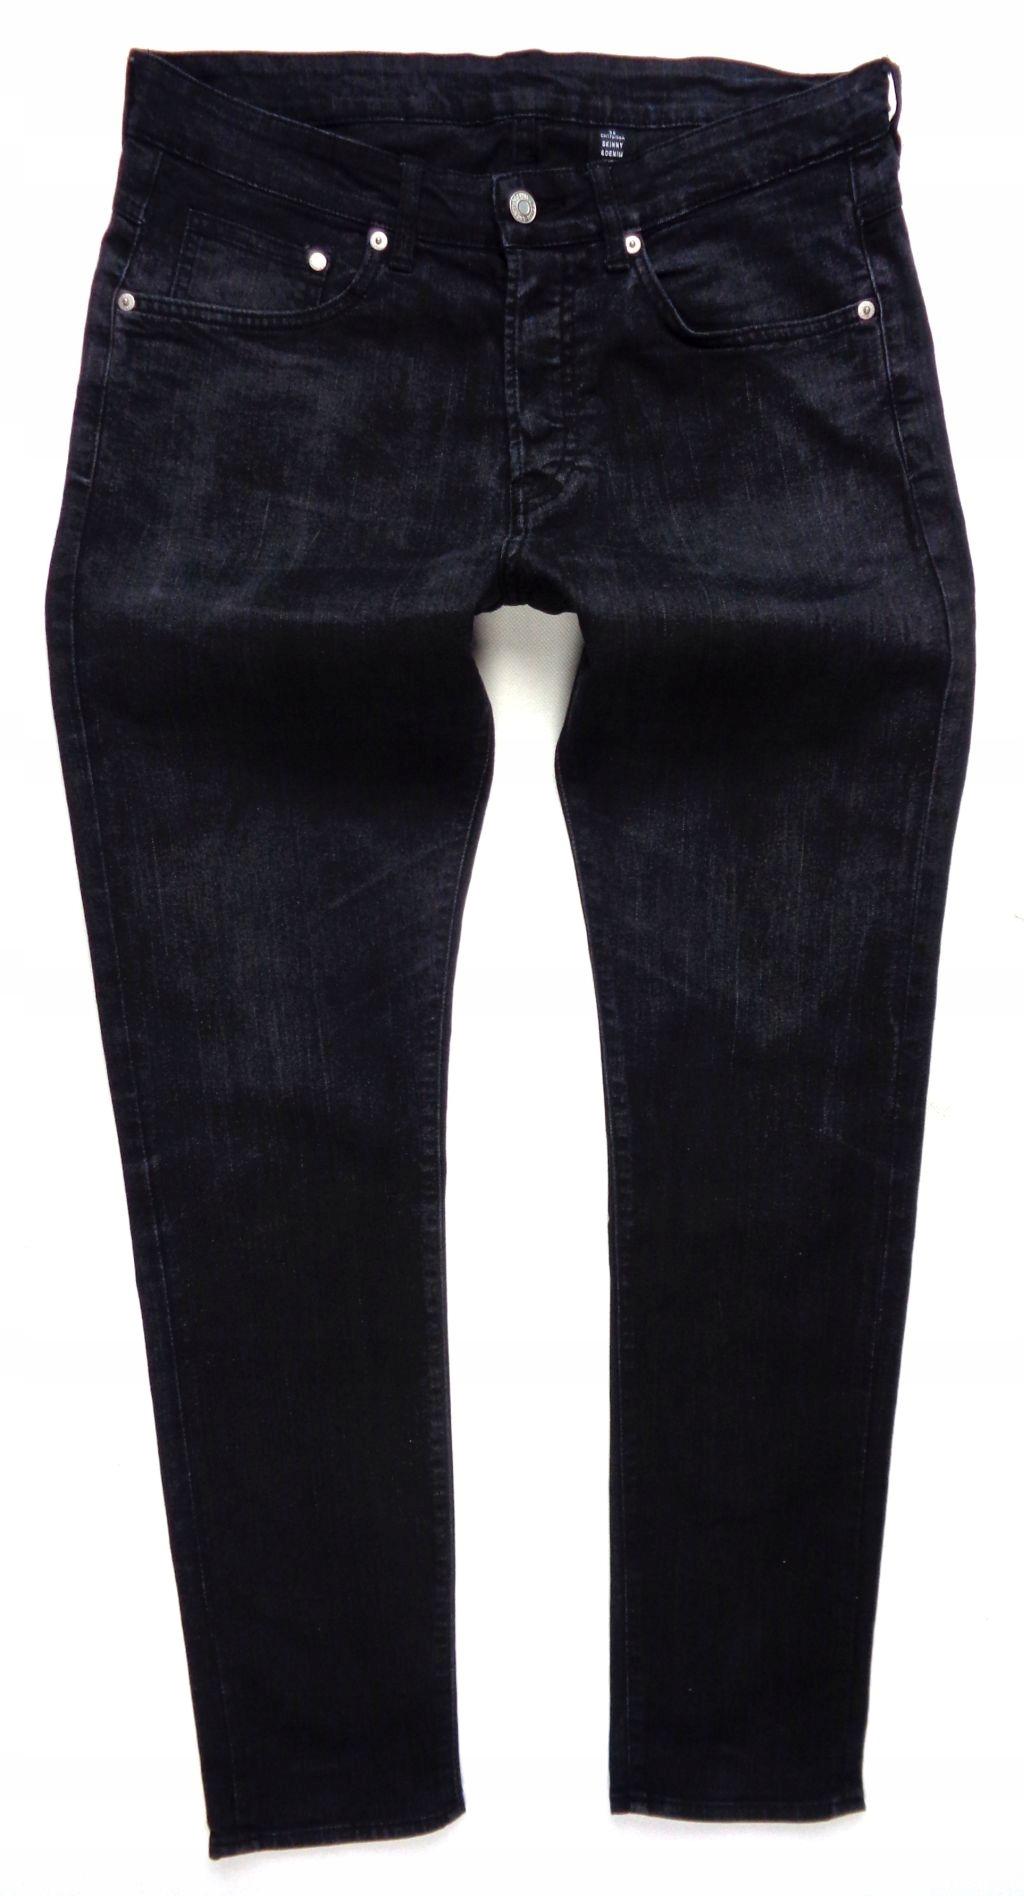 286 H&M jeans rurki przetarcia VINTAGE 34